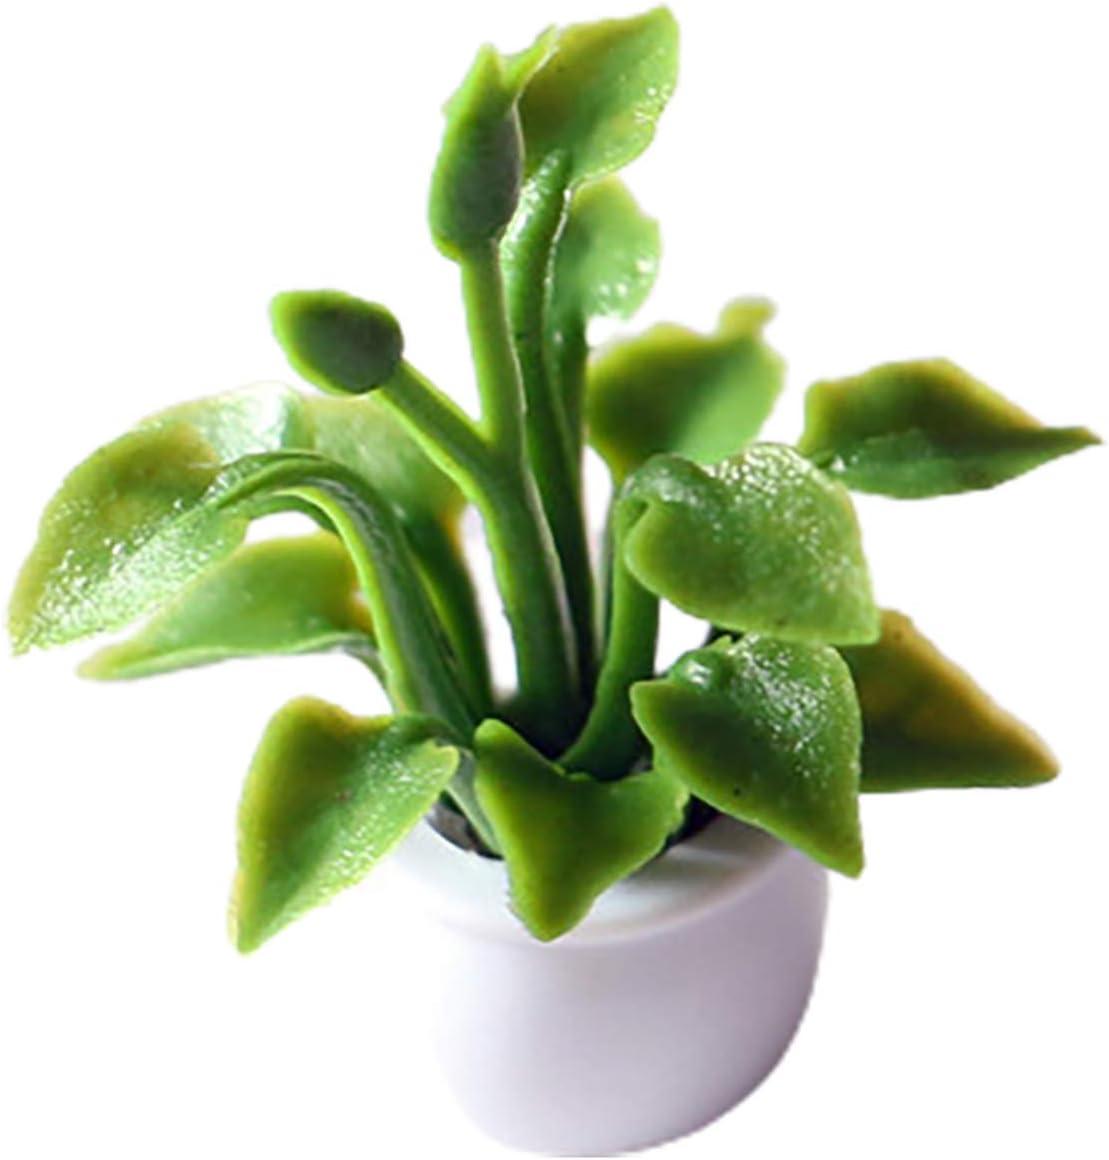 Goodilest Super beauty product restock quality top! Dollhouse New arrival Plant Bonsai Simulation Mini High Pot